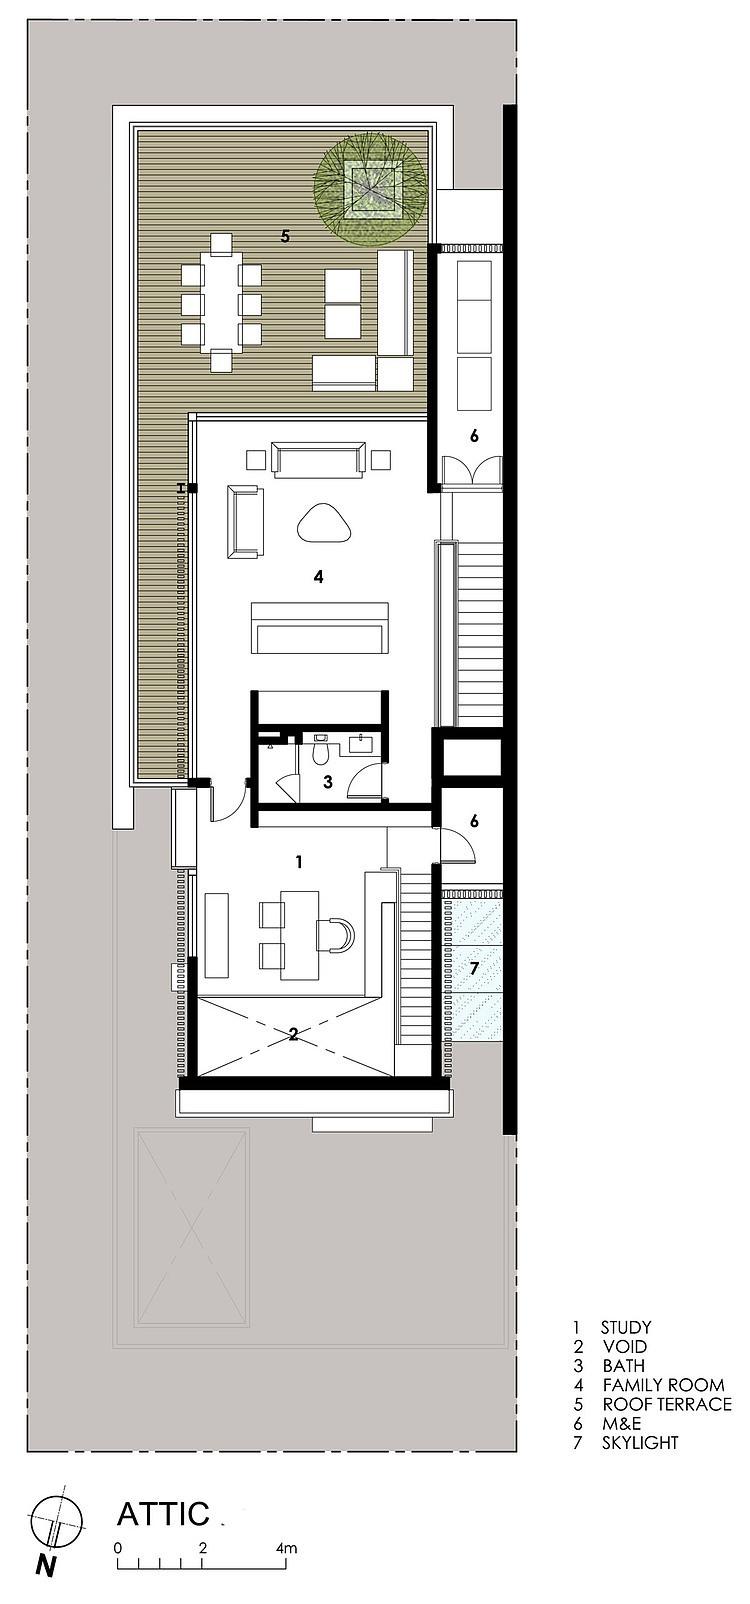 020 sight house wallflower architecture design homeadore - Wall flower design ...